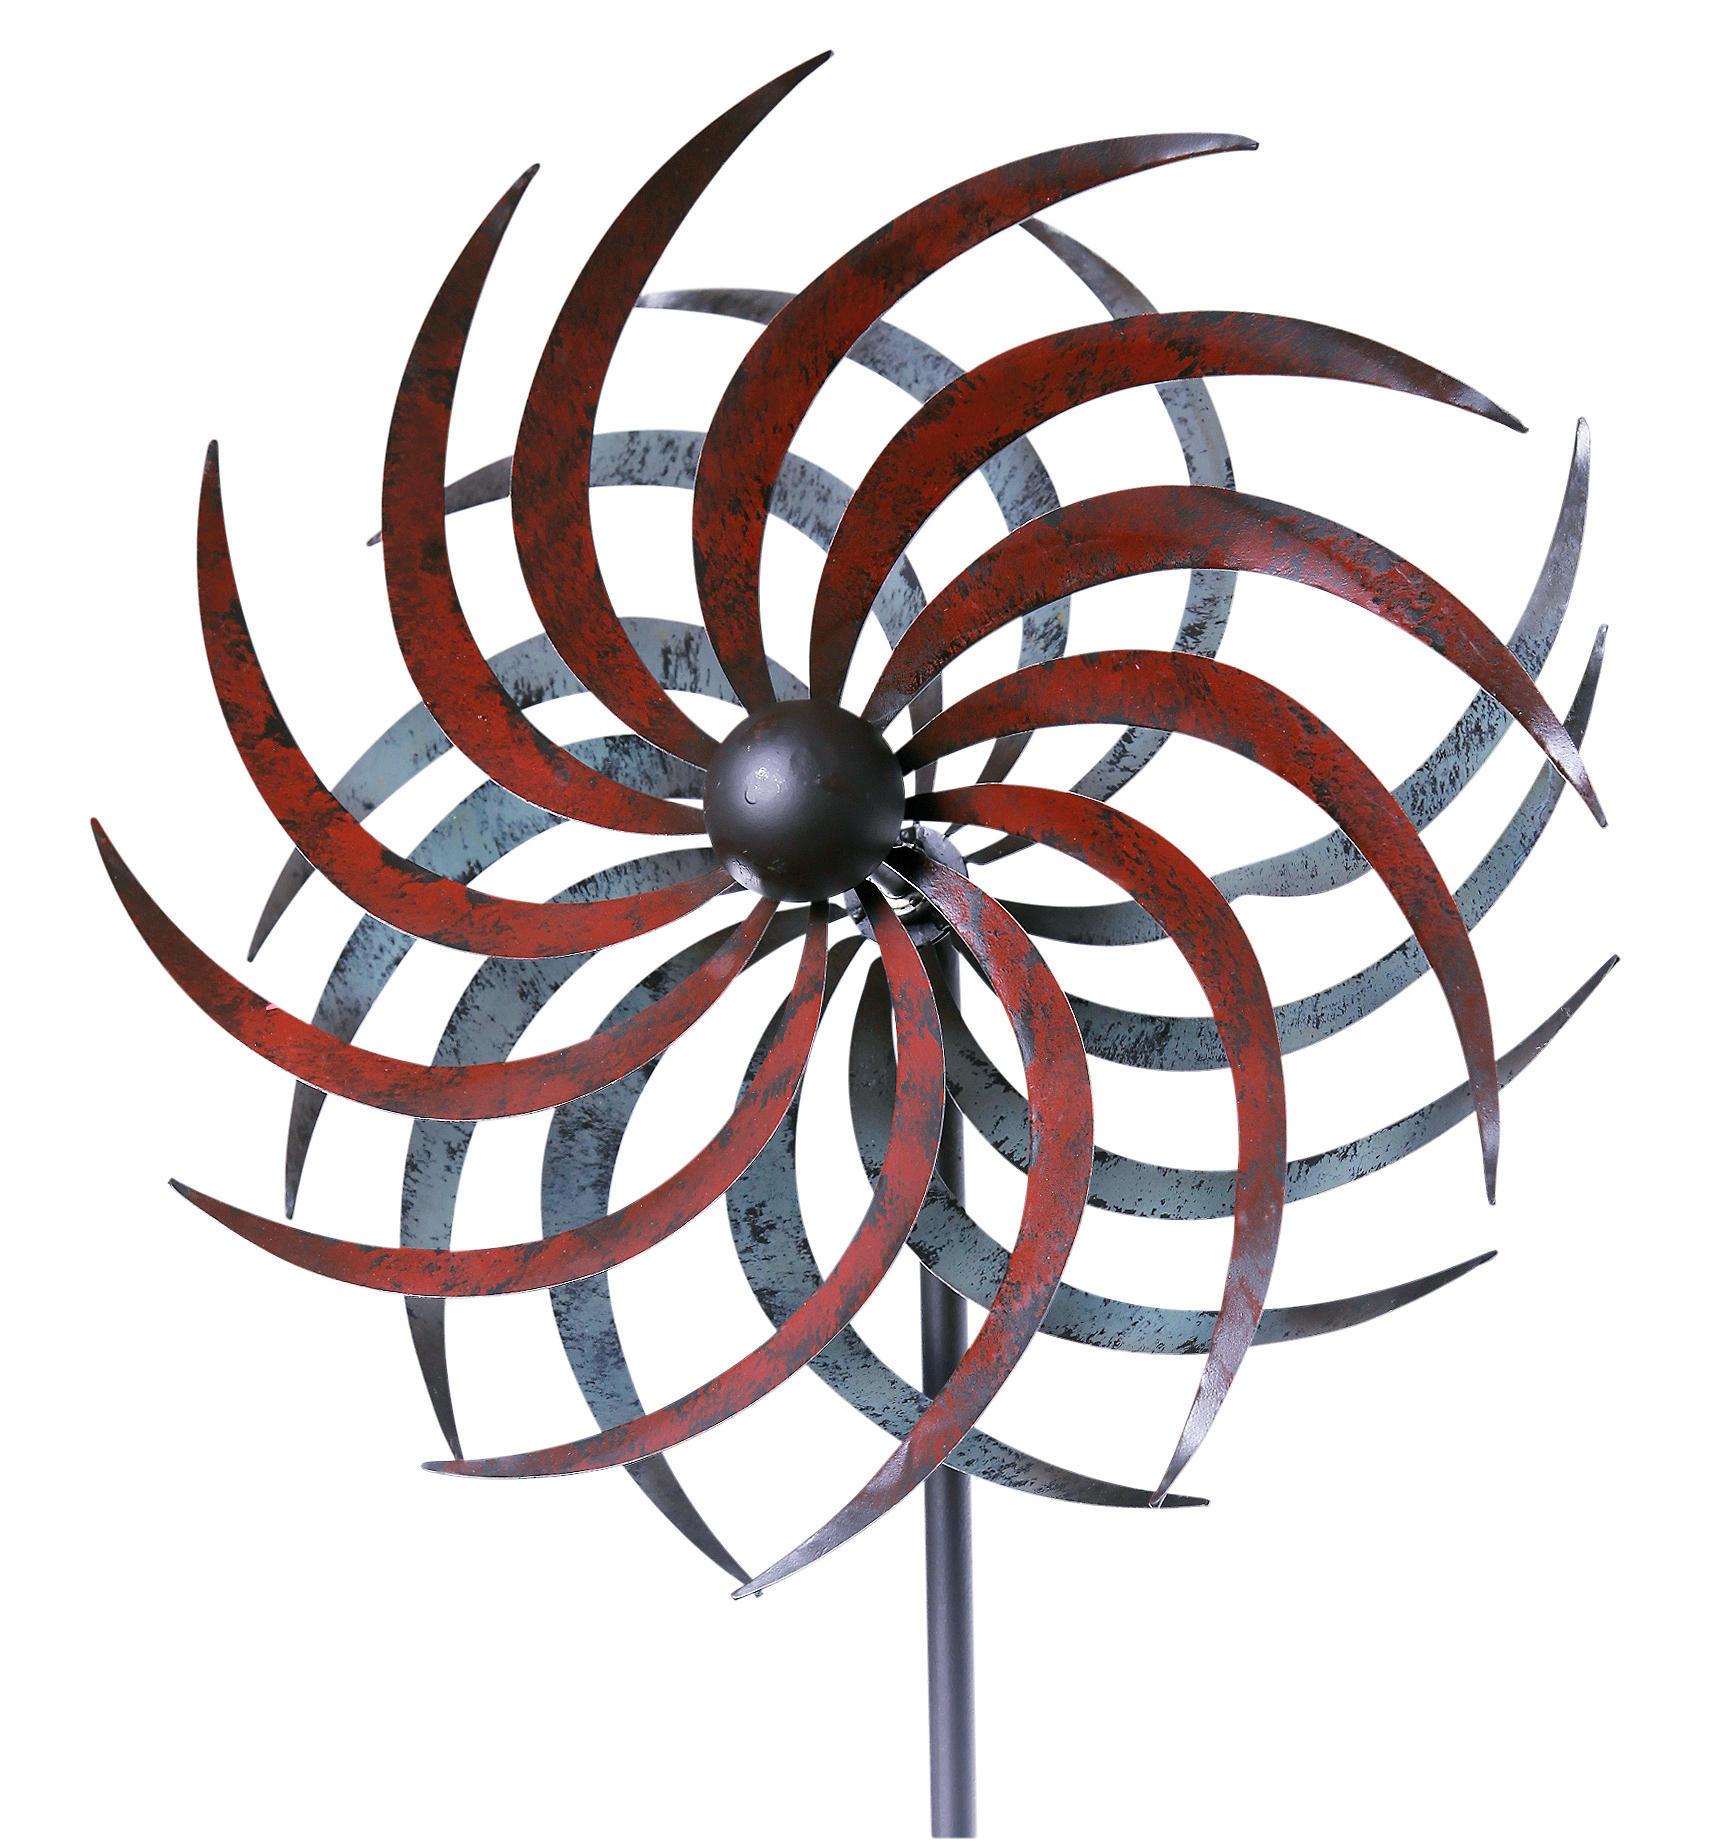 Windrad Garten  Windrad Garten Mallorca Metall NEU & OVP